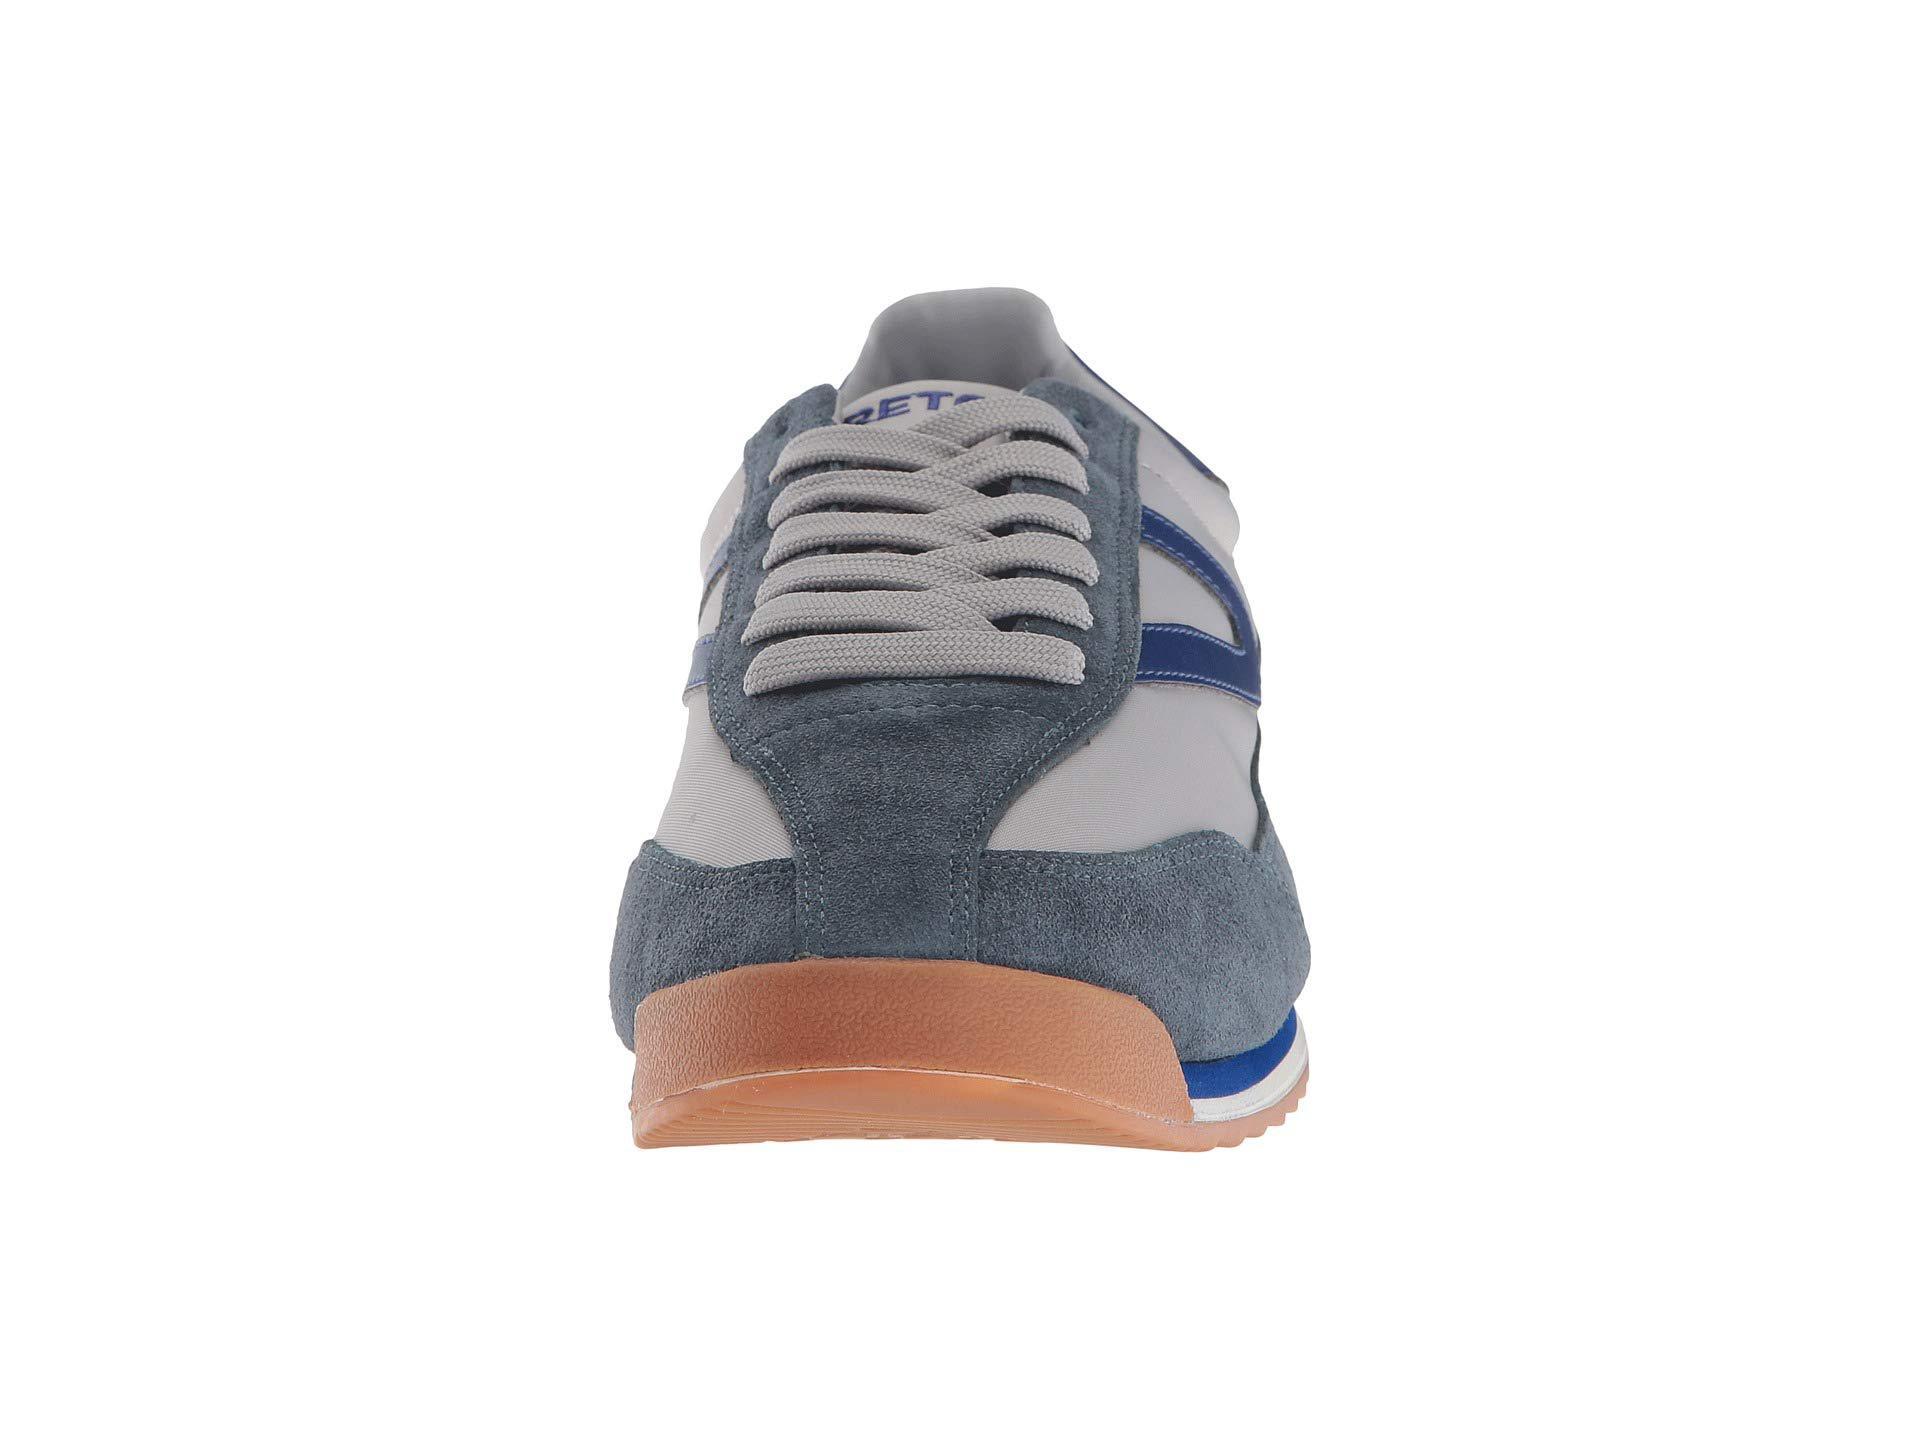 Tretorn Suede Rawlins 2 Baltico Smoke Focal Blue Shoes